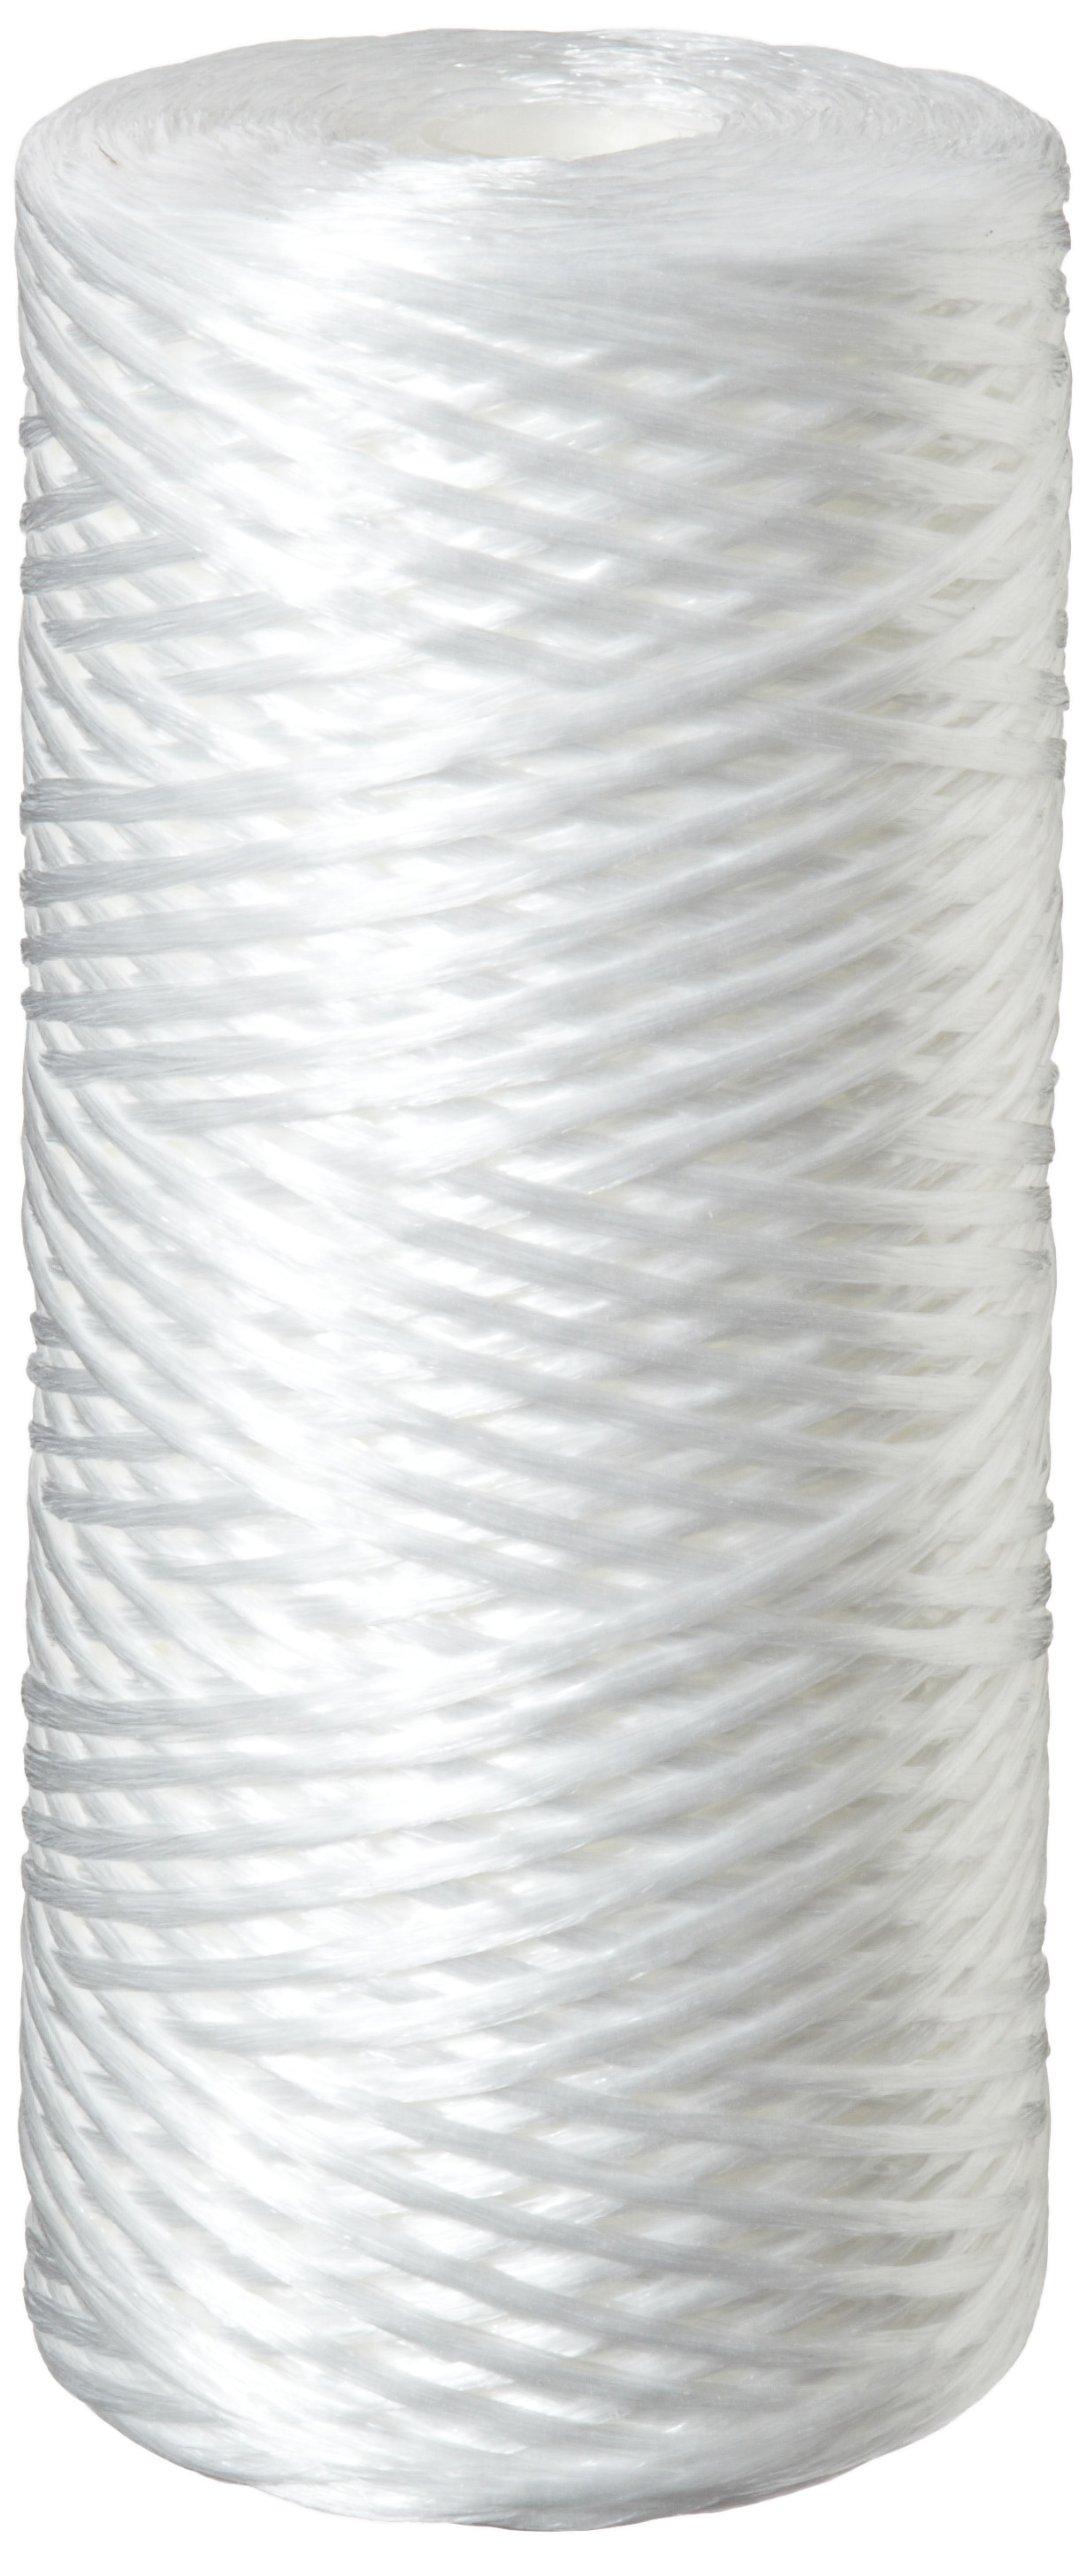 Pentek WPX10BB97P String-Wound Polypropylene Filter Cartridge, 10'' x 4.5'', 10 Microns